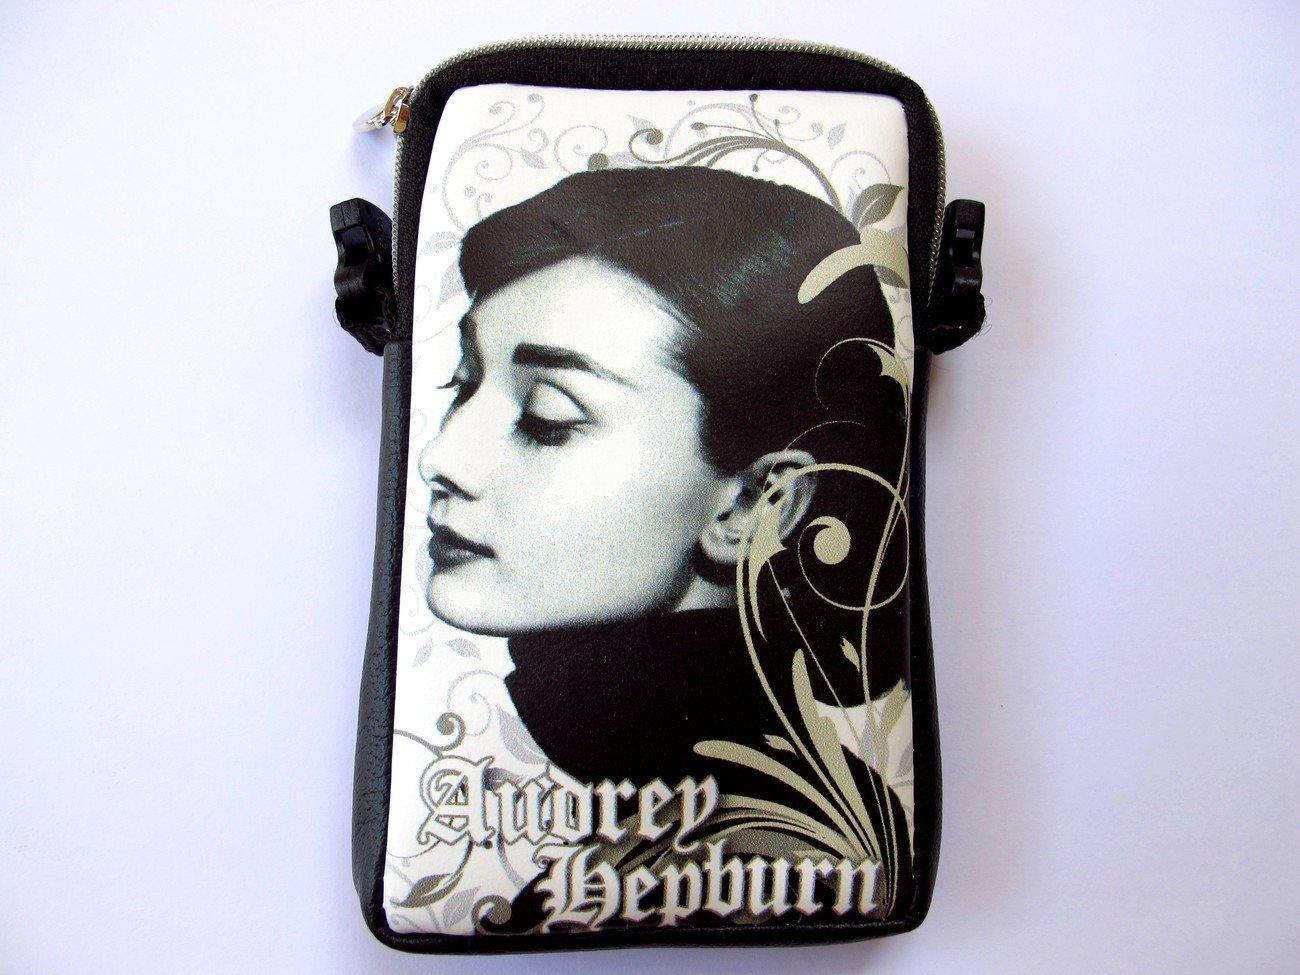 Audrey Hepburn Retro Mobile Phone Digital Camera Case Pouch Bag